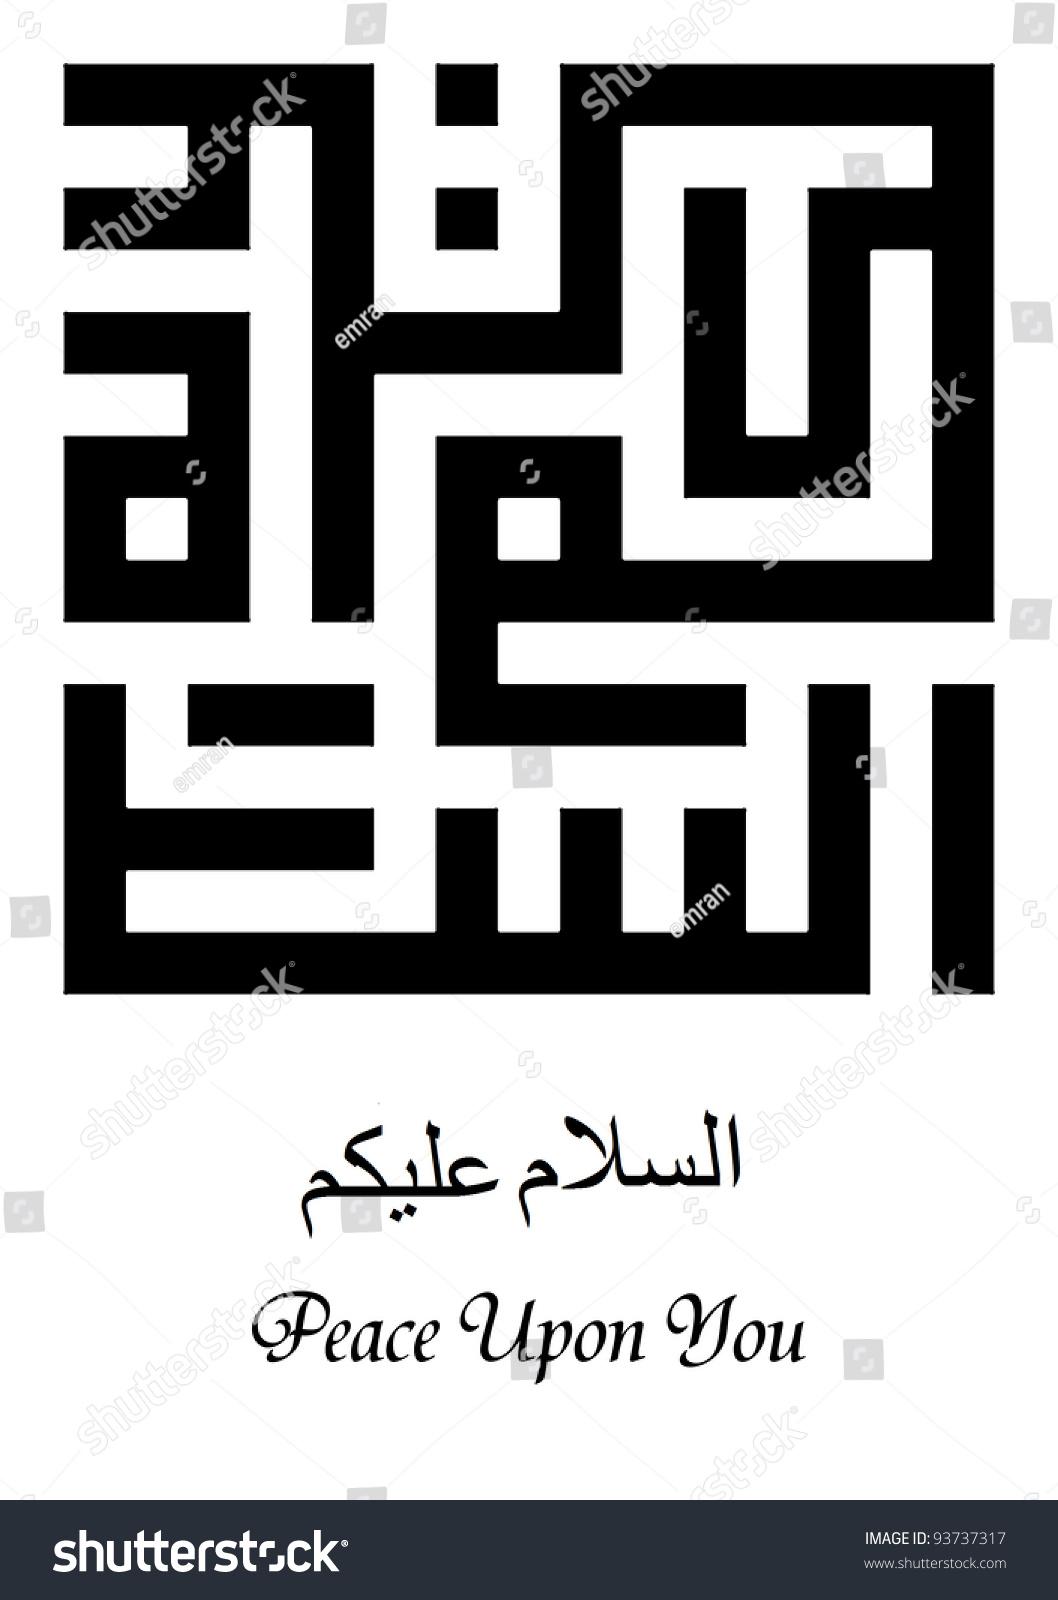 Assalamualaikum translated as peace upon you in arabic